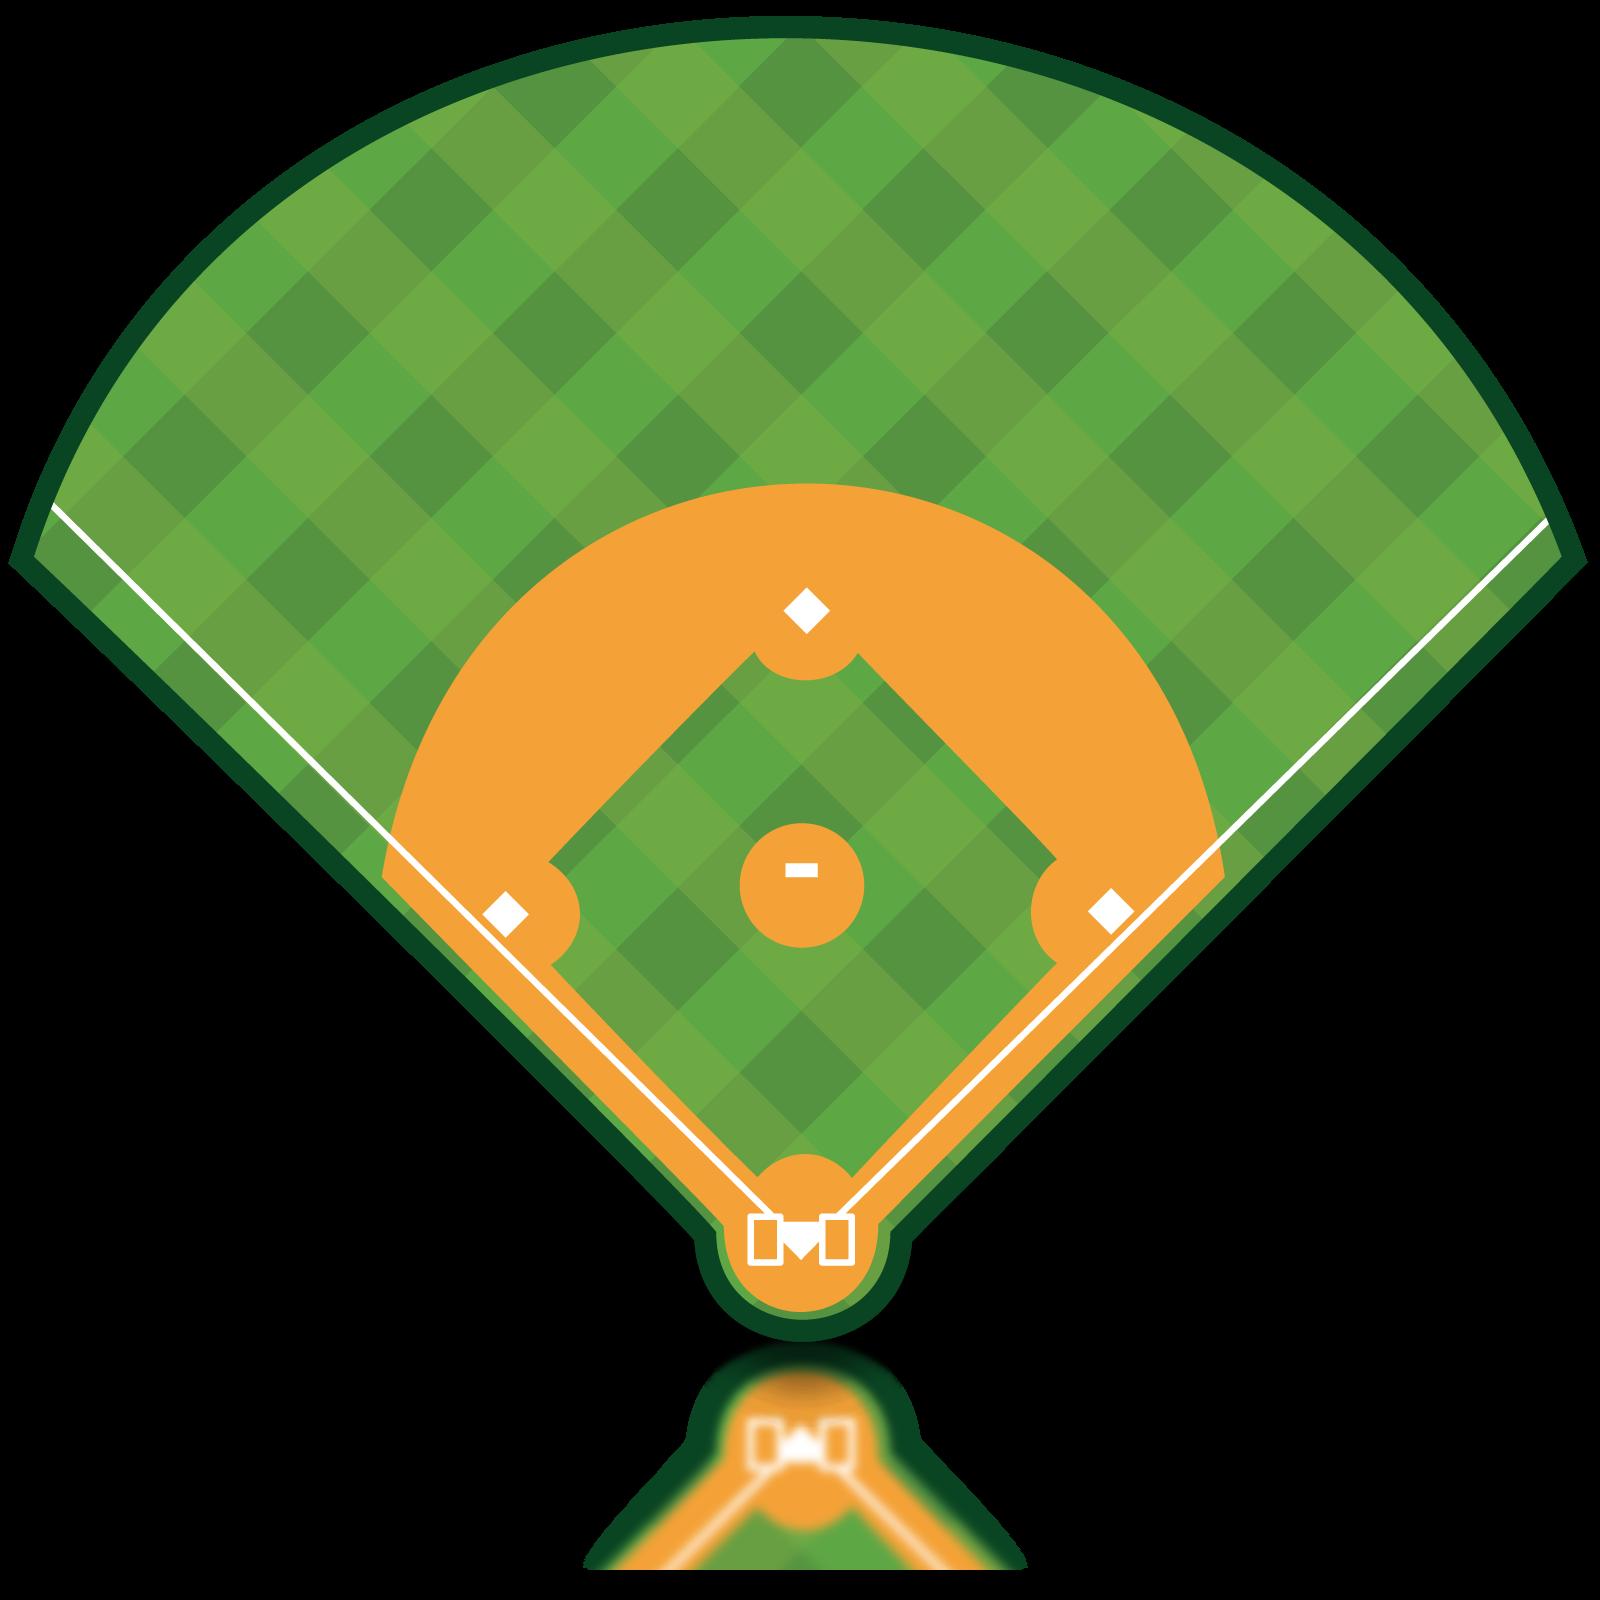 Clipart diamond baseball field. Volunteer opportunities